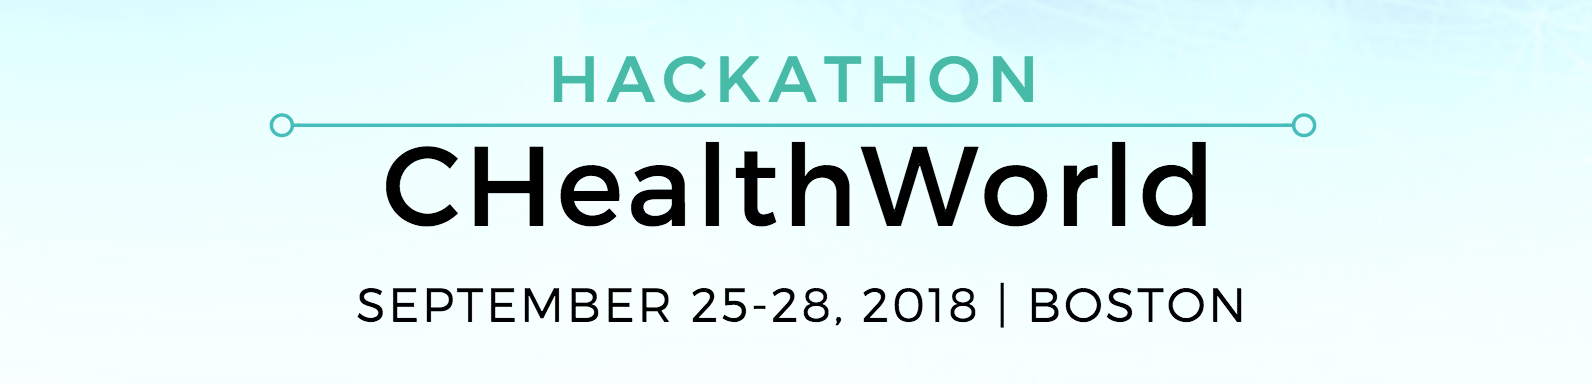 CHealthWorld Hackathon